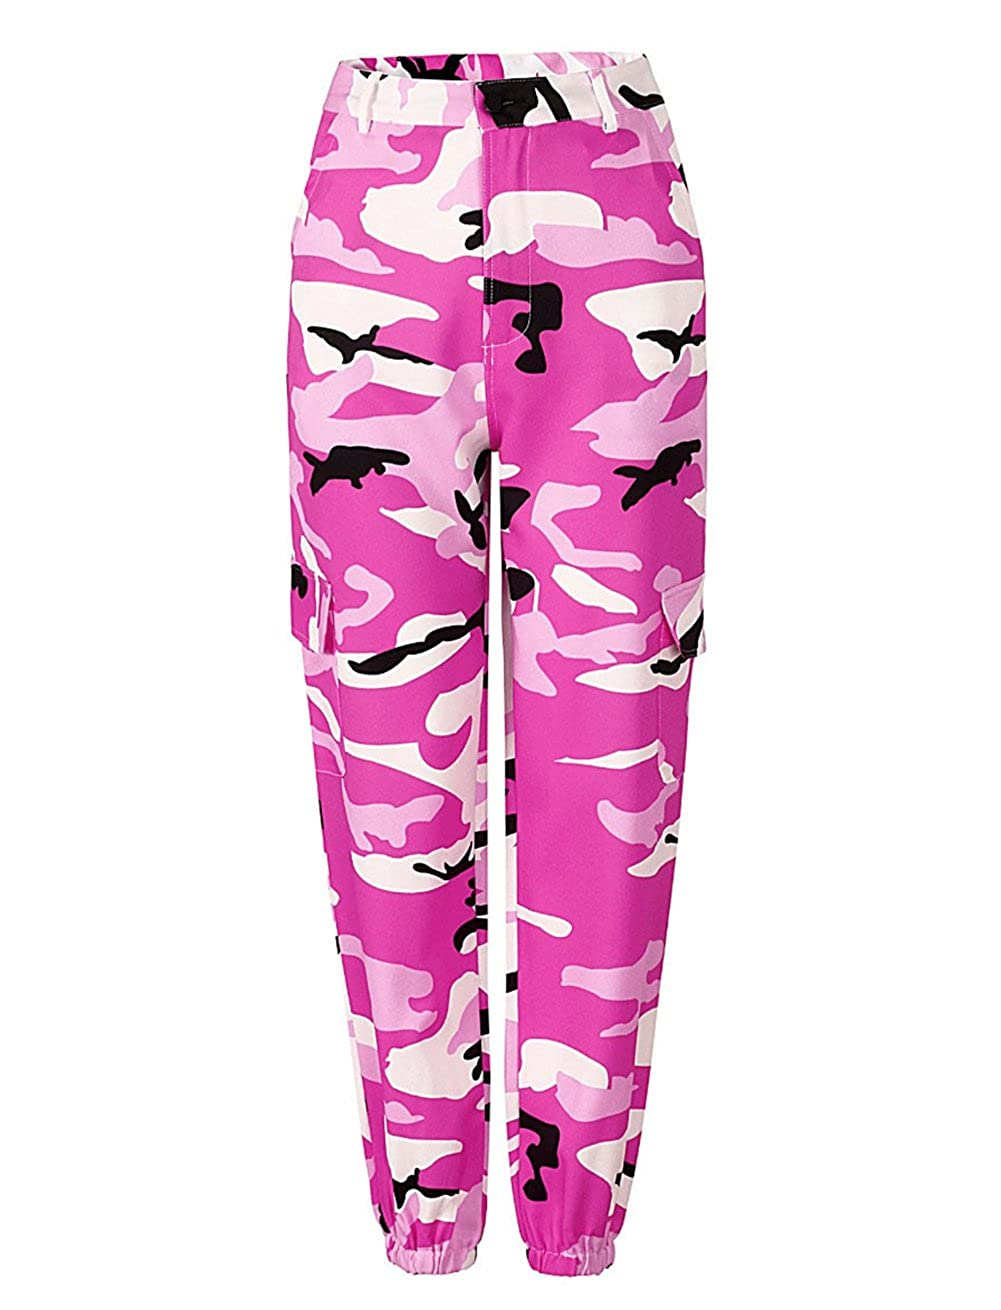 KOERIM Women's Camo Cargo Pants Casual Outdoor Sports Camouflage Trousers